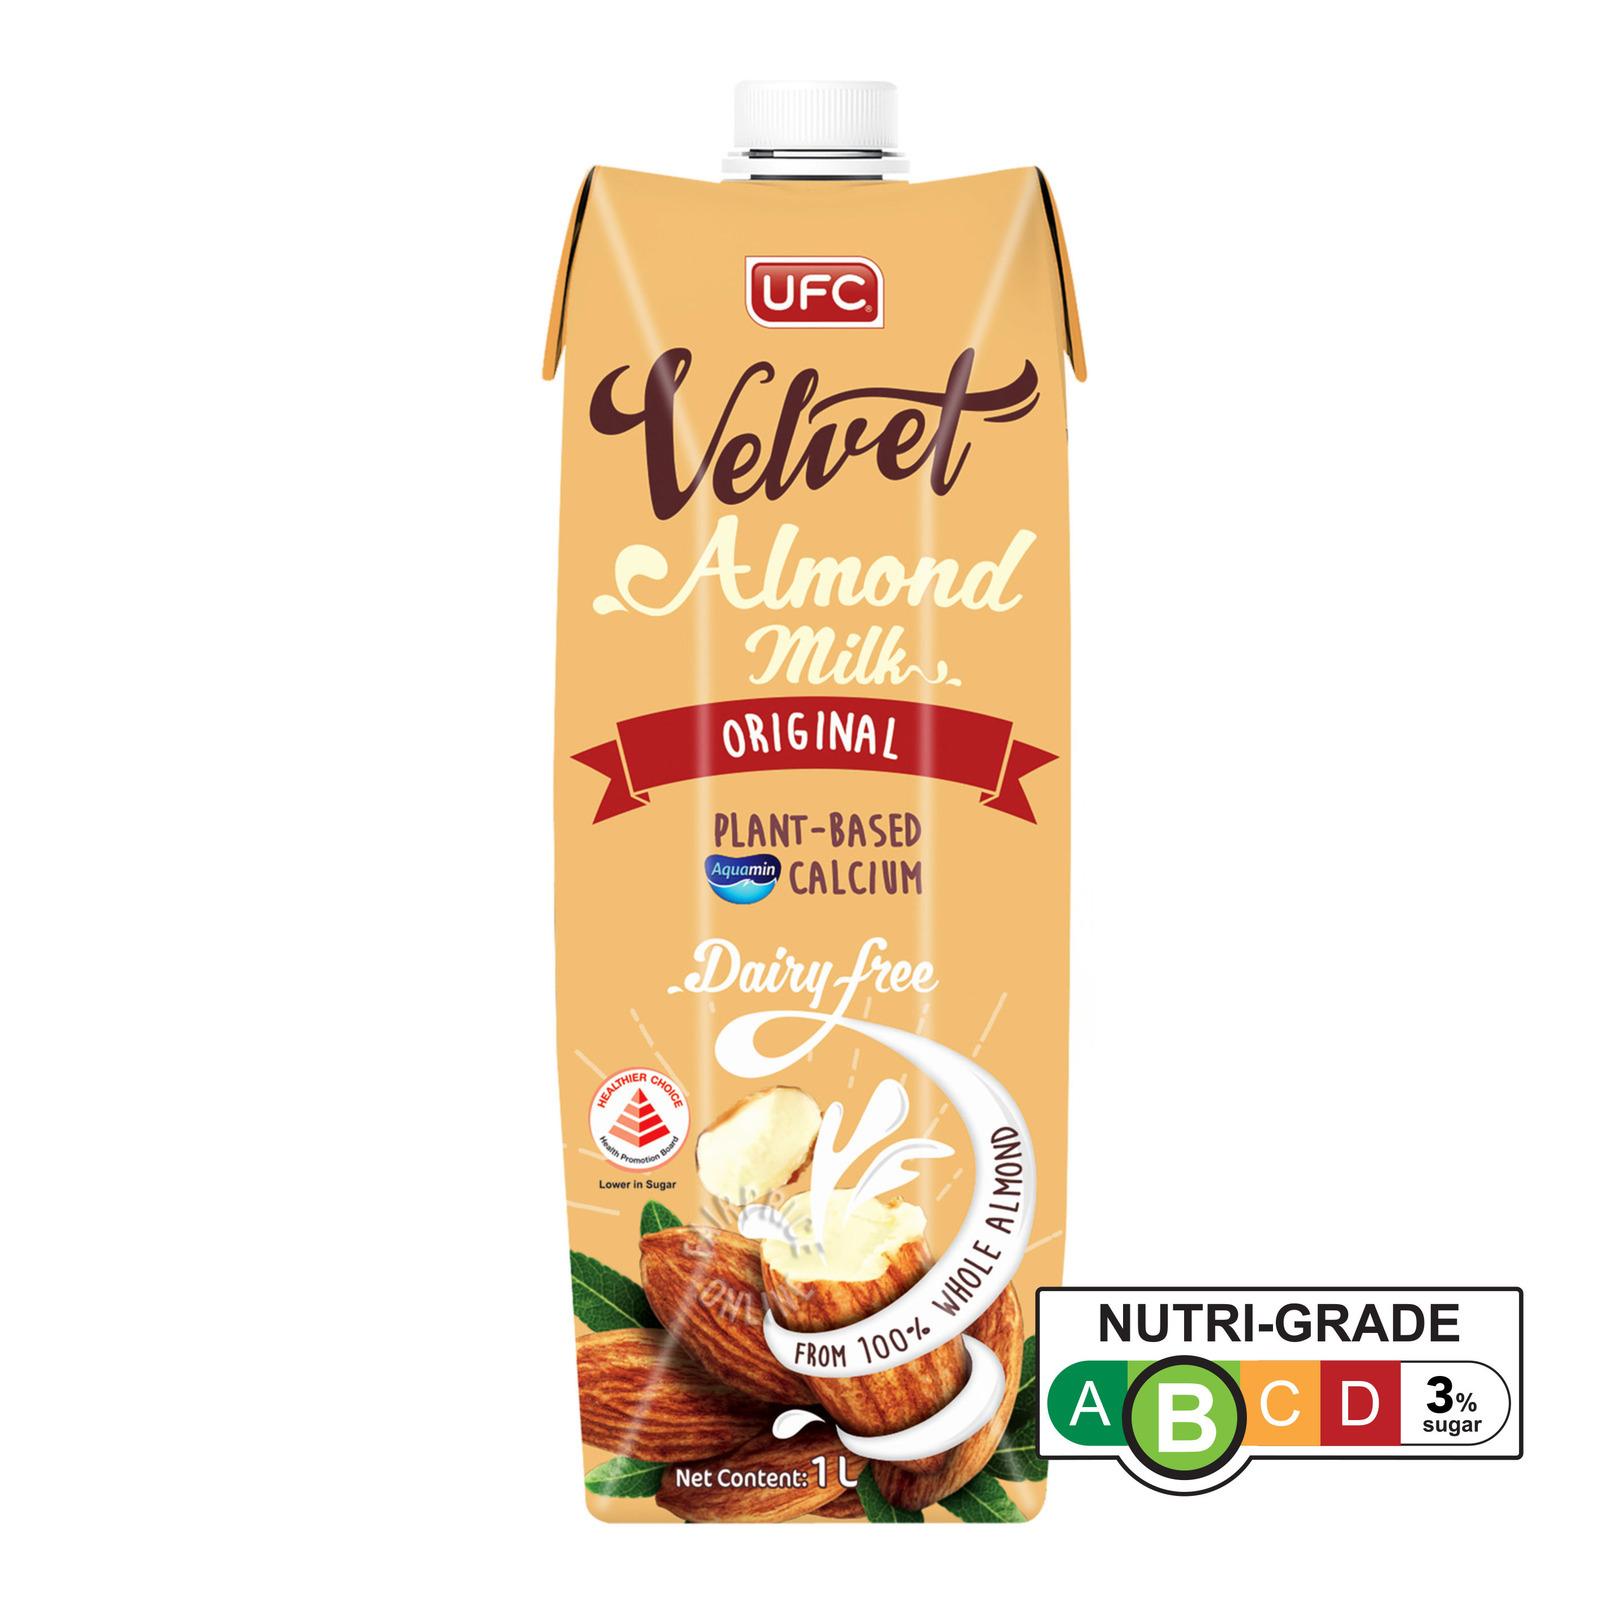 UFC Velvet Almond Milk - Original